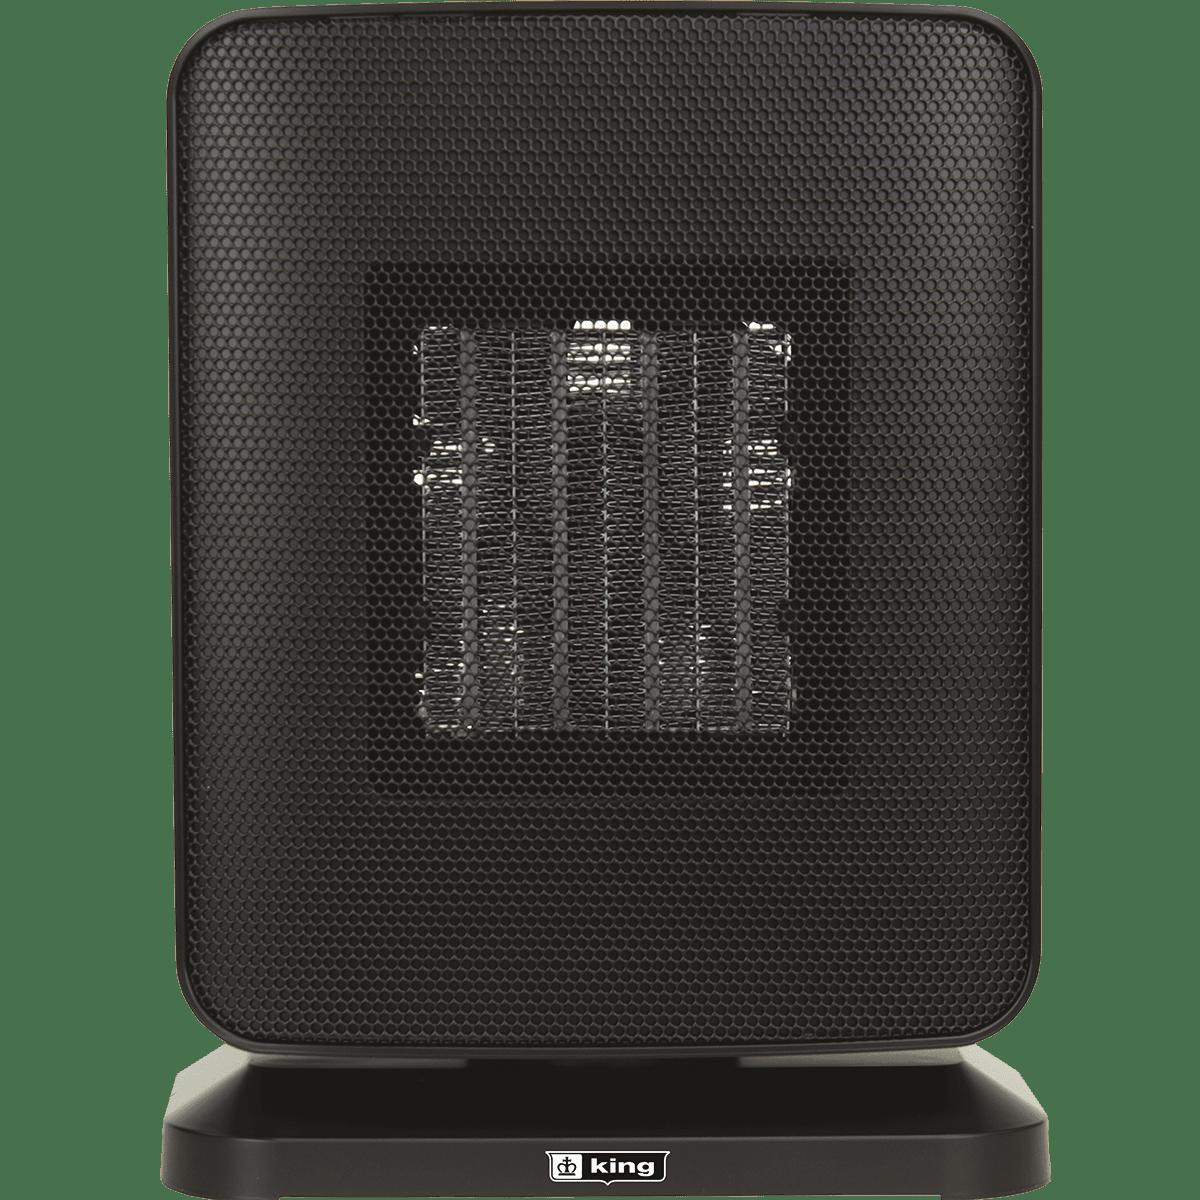 King Electric 1500w Portable Bathroom Heater W Electronic Controls Ph 7